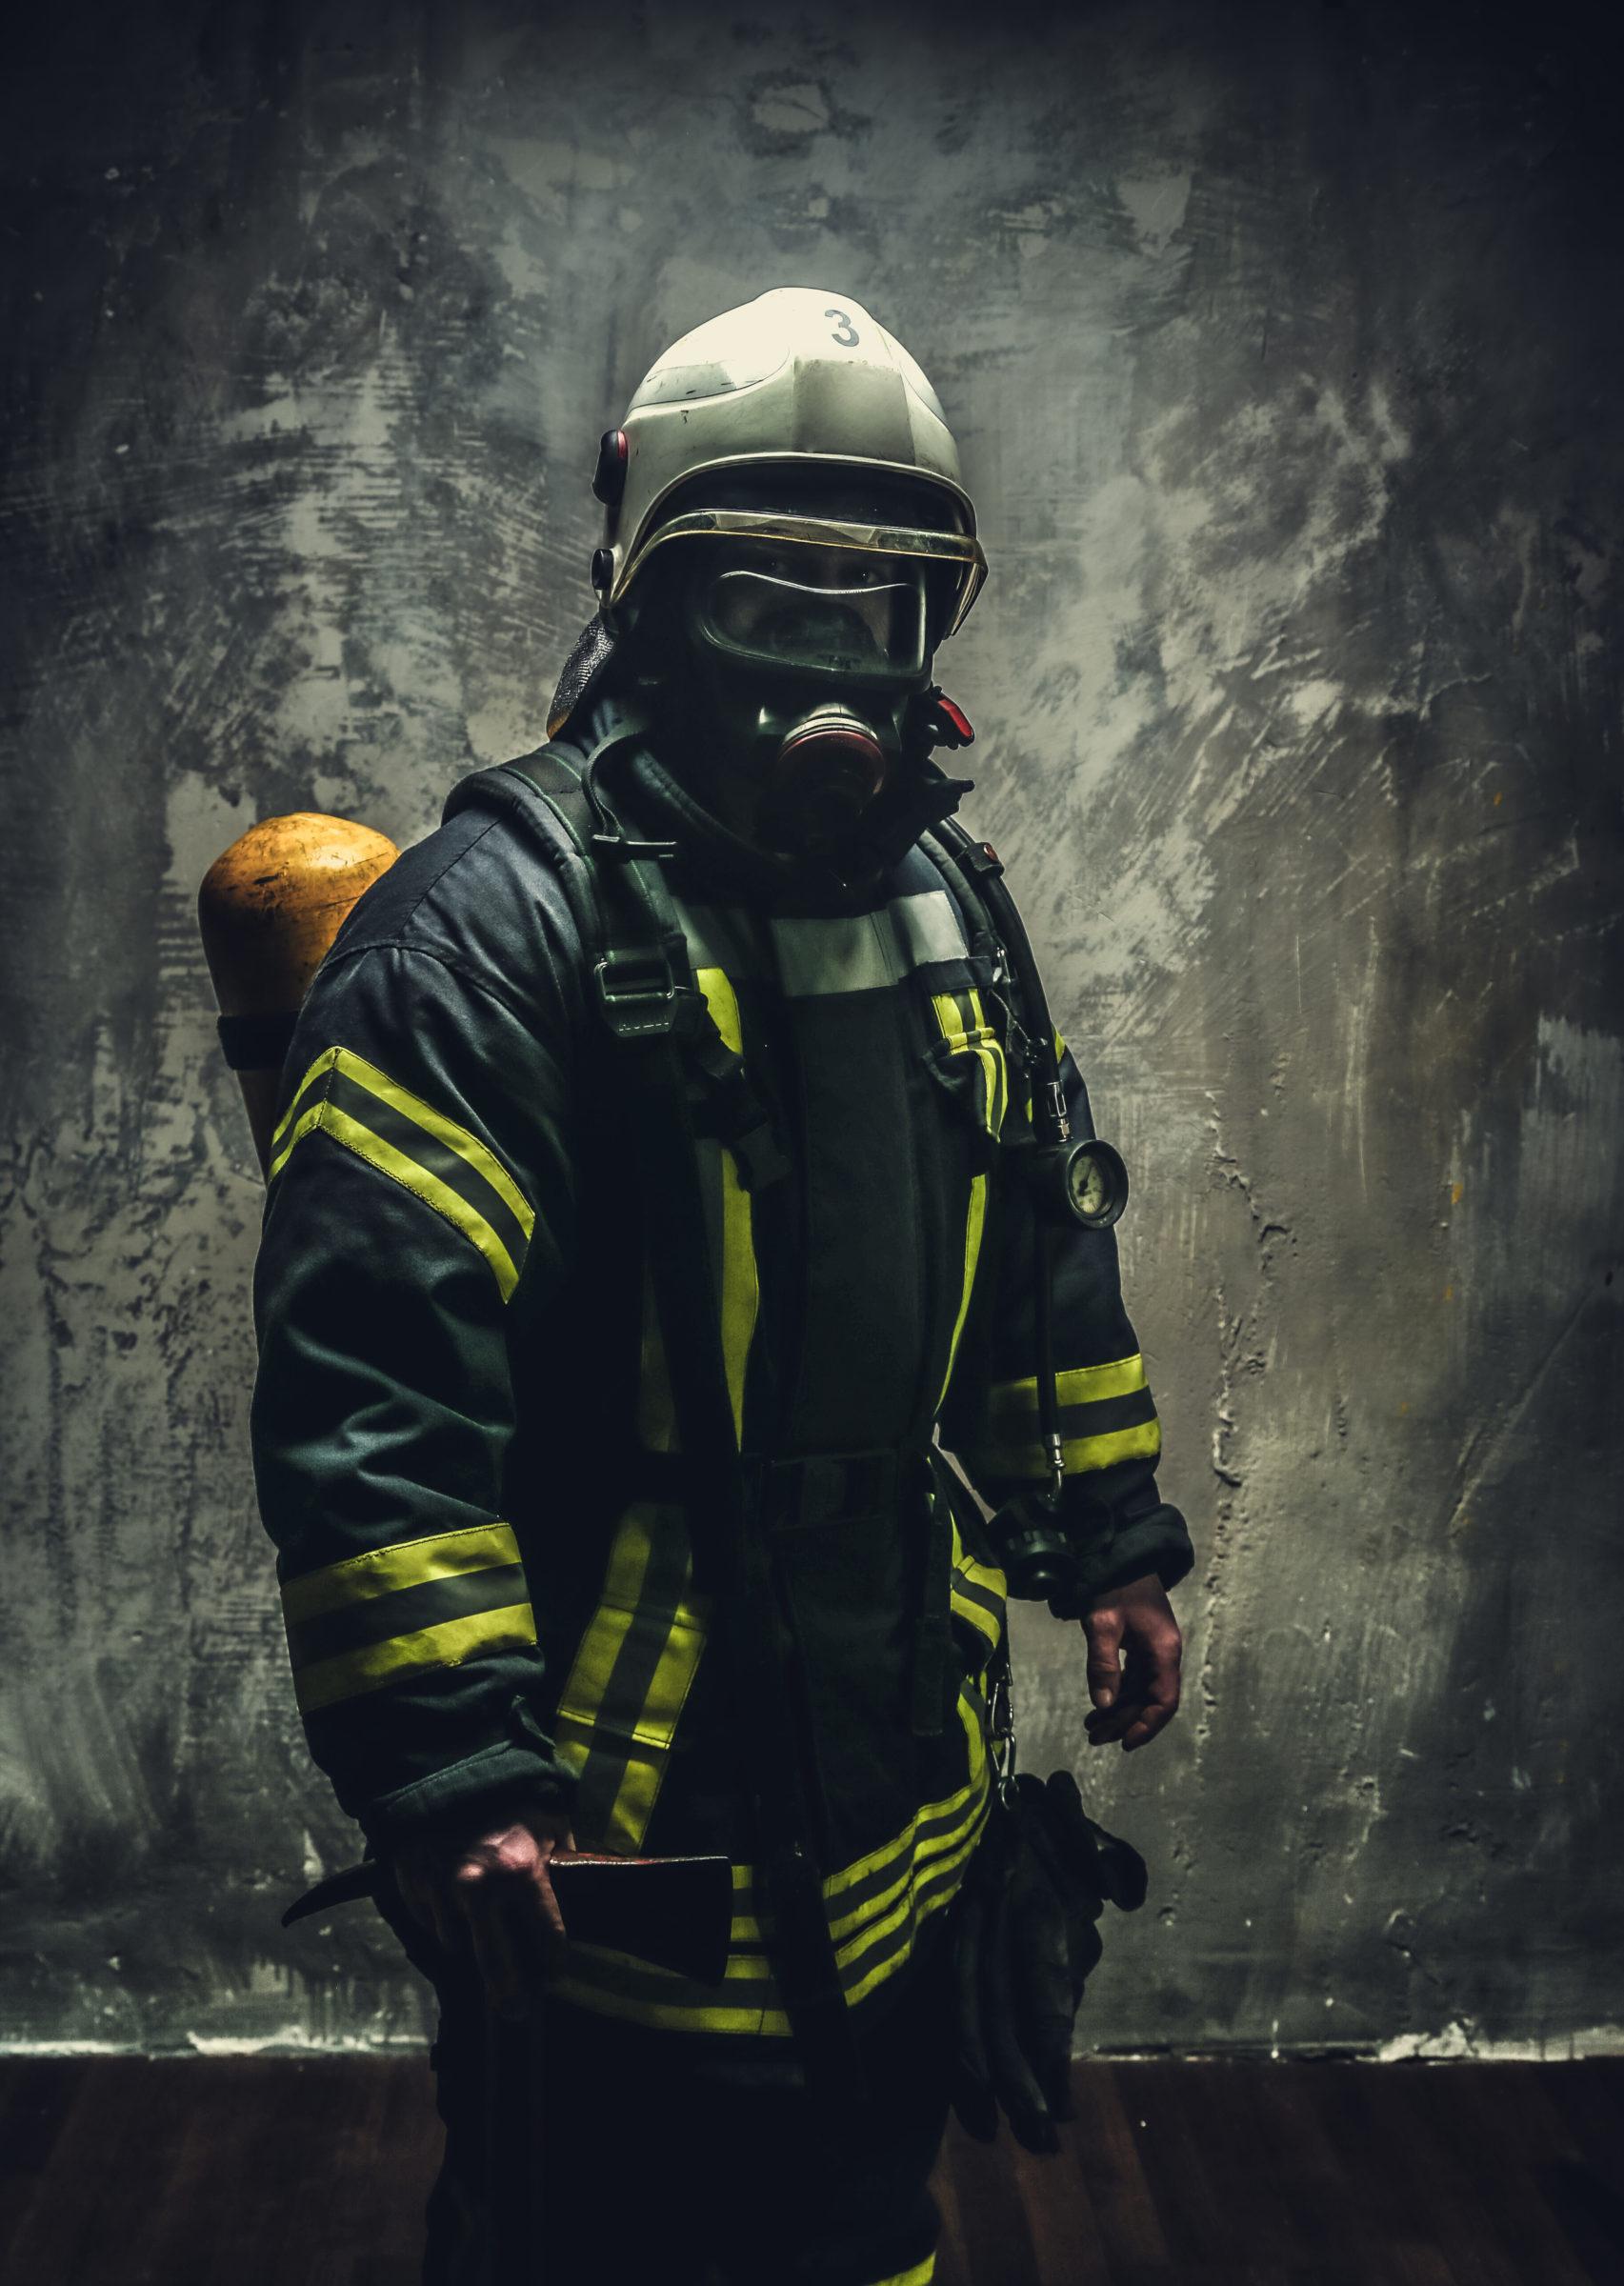 rescue man in firefighter uniform H8WGST4